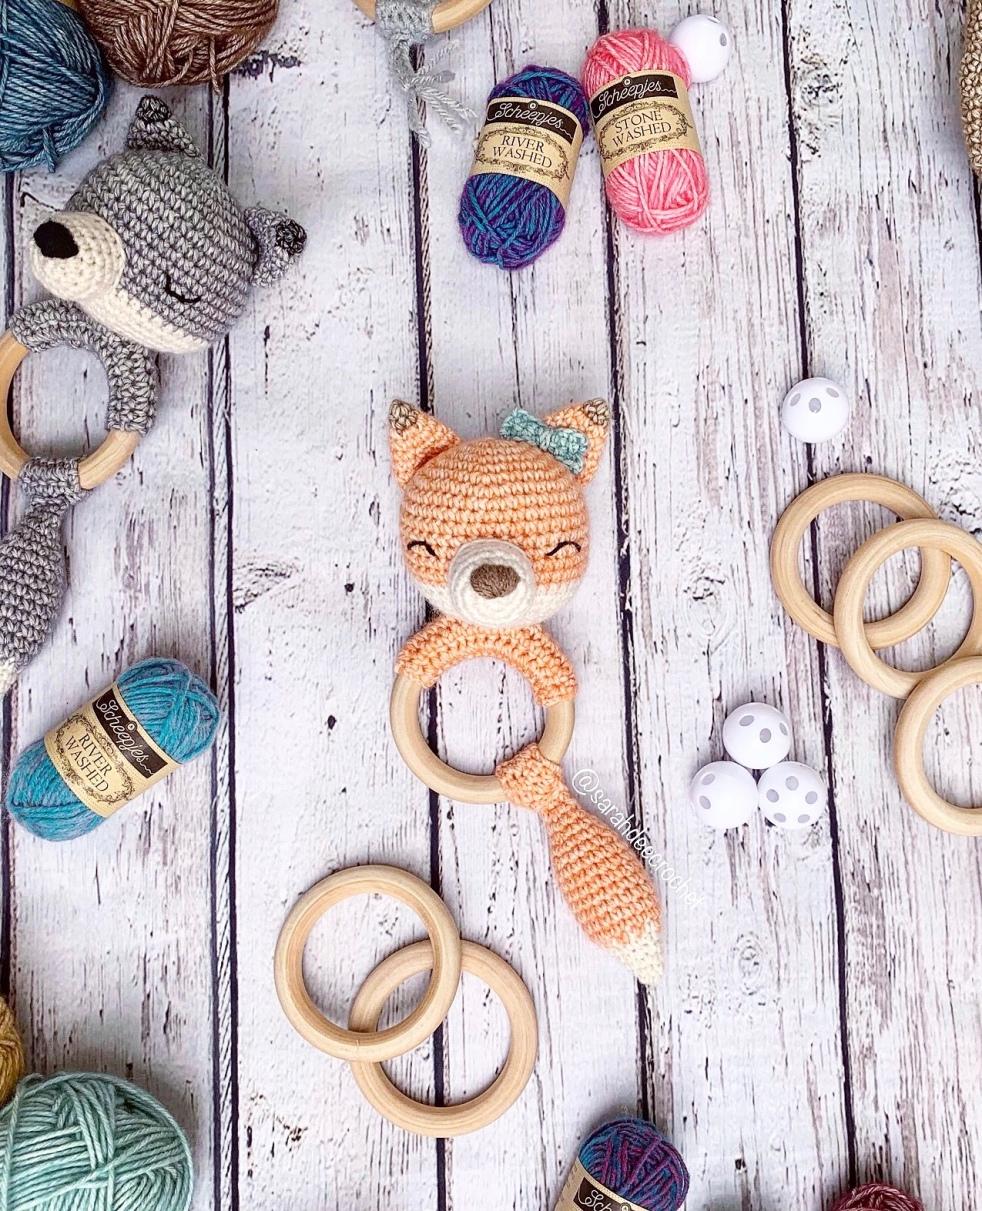 Best Amigurumi Free Patterns and Crochet Animals - Örgü Modelleri | 1212x982